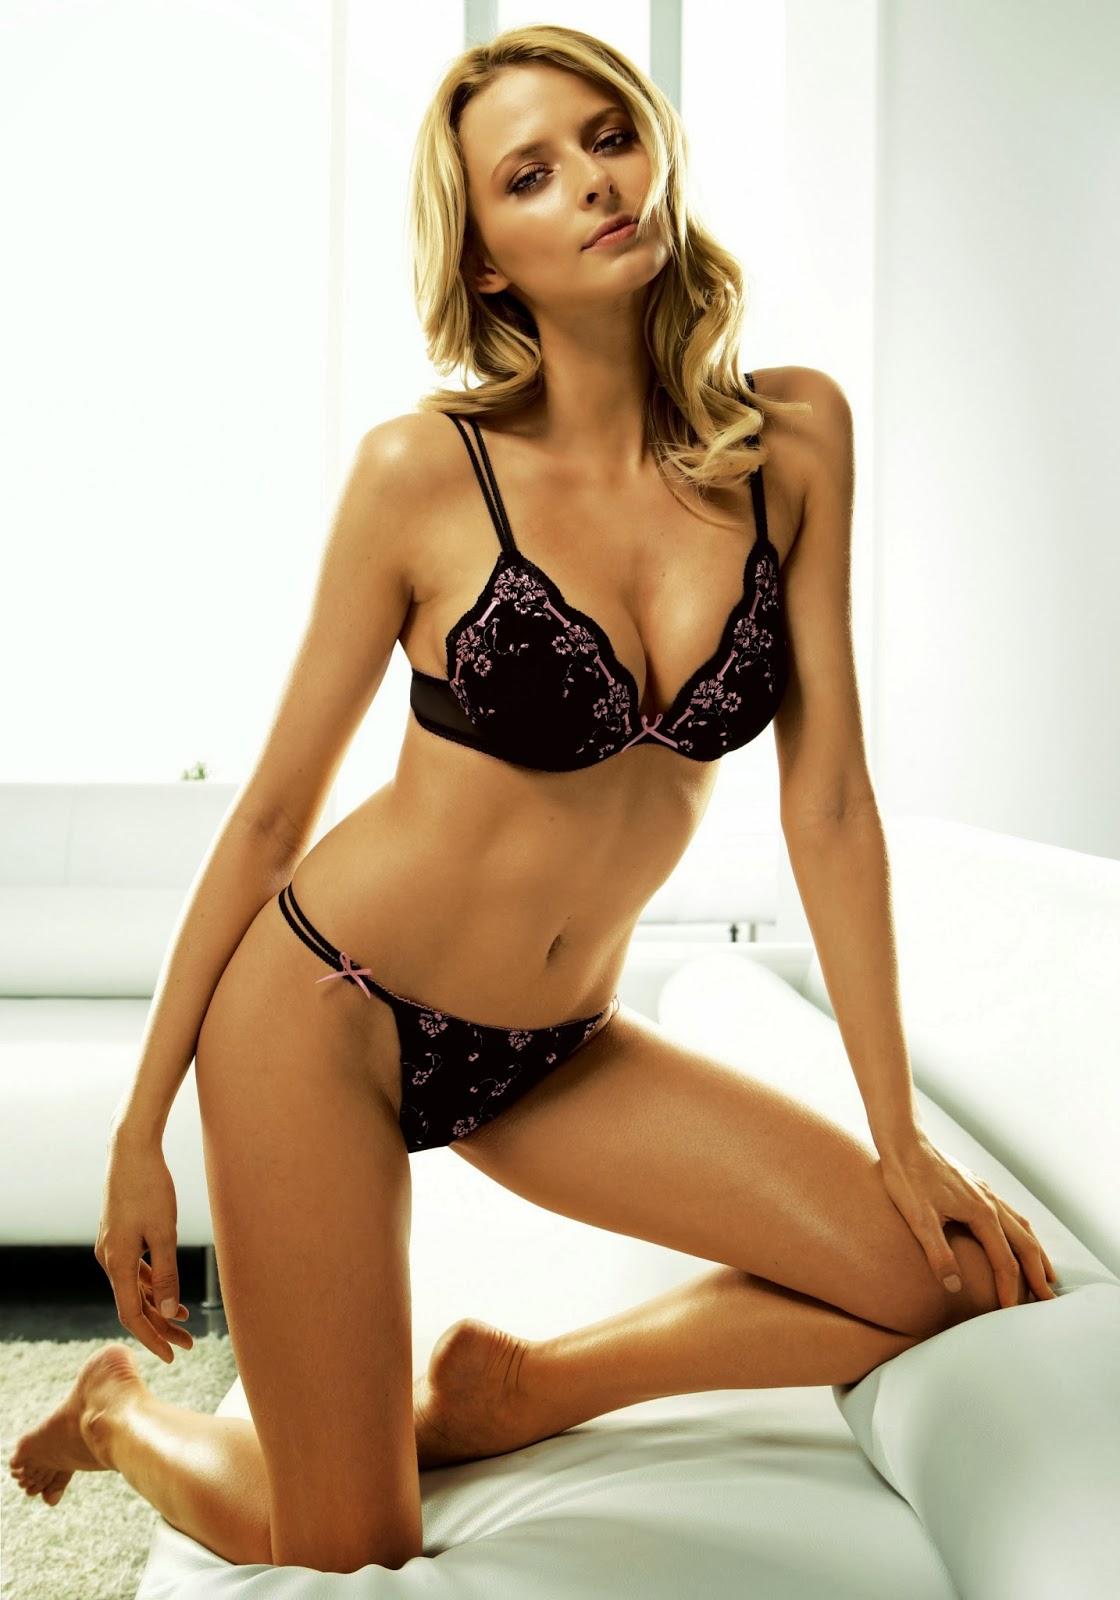 Model porno top